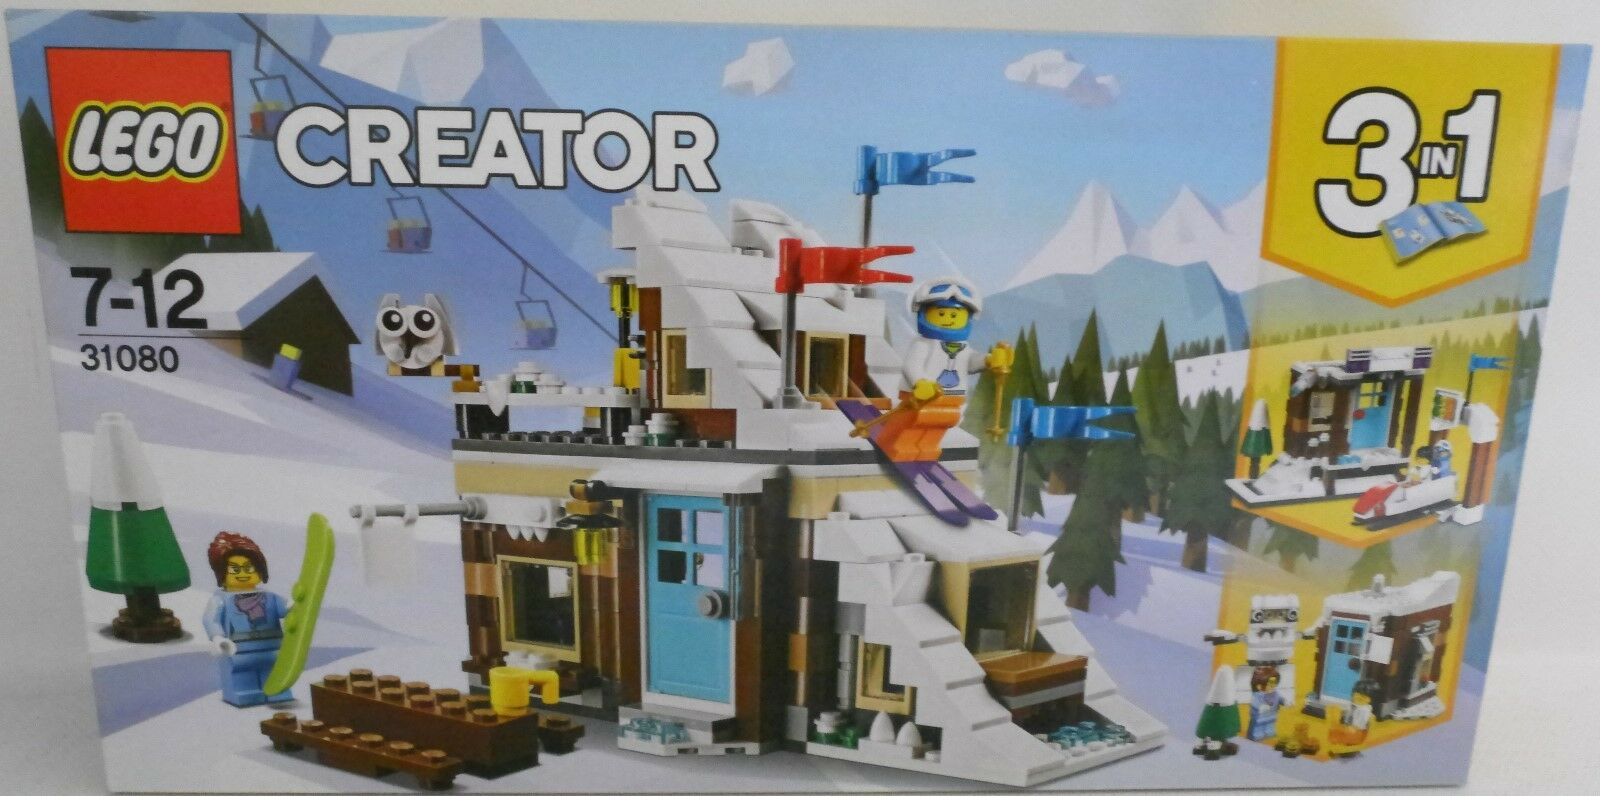 NEU LEGO® CREATOR 31080 Modulares Wintersportparadies 3 in 1 OVP